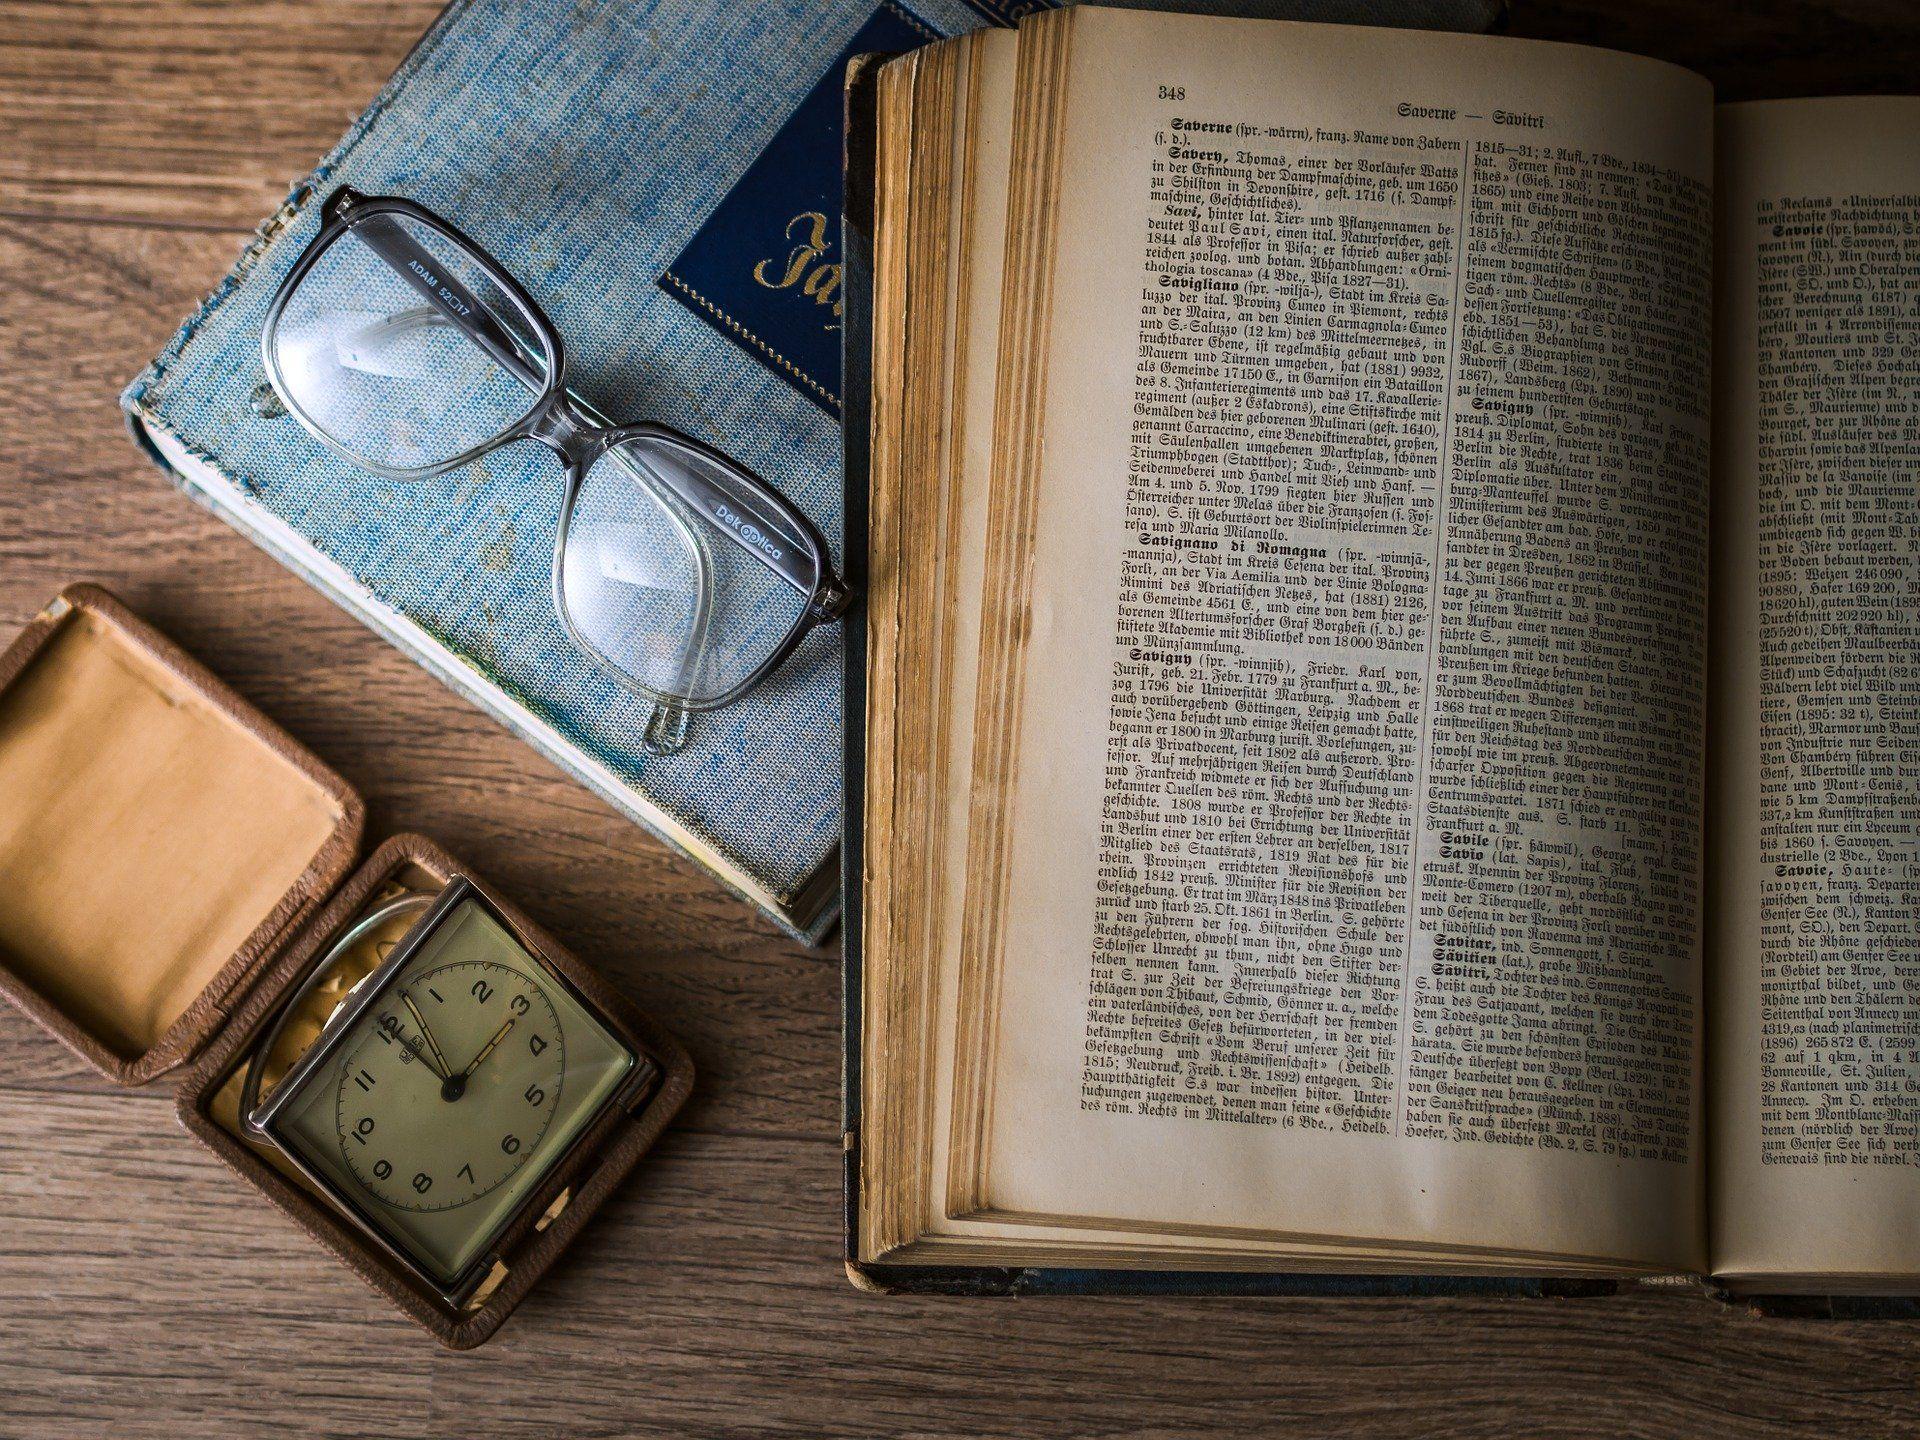 Genealogy Gifts - Genealogy Pricing - Oak Ancestry